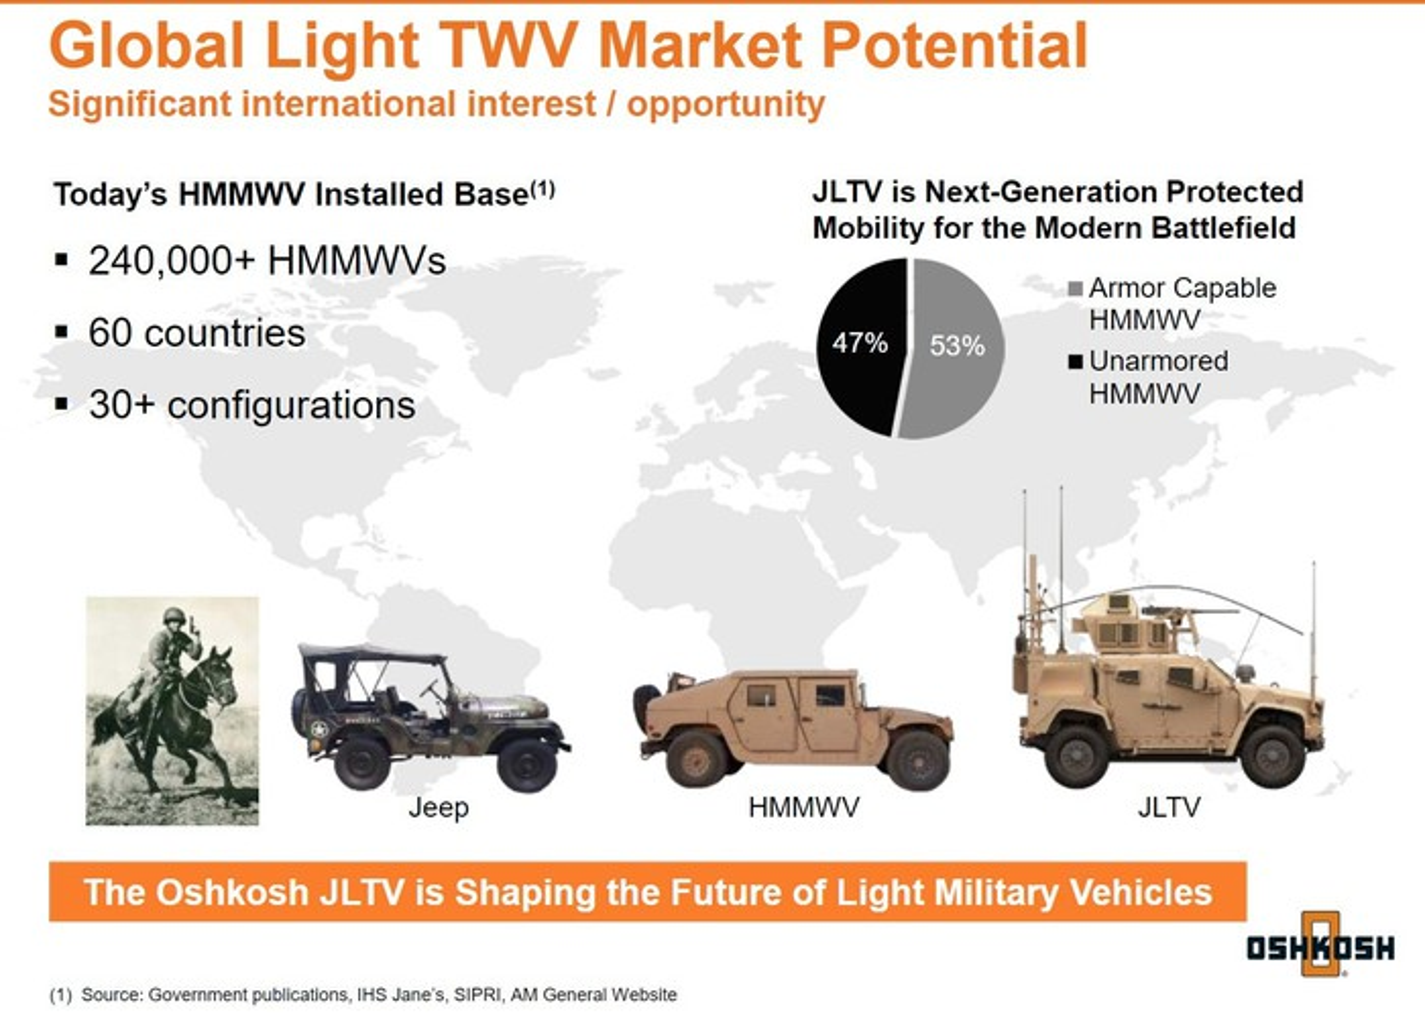 Slide from Oshkosh's February 2019 investor presentation showing JLTV market potential